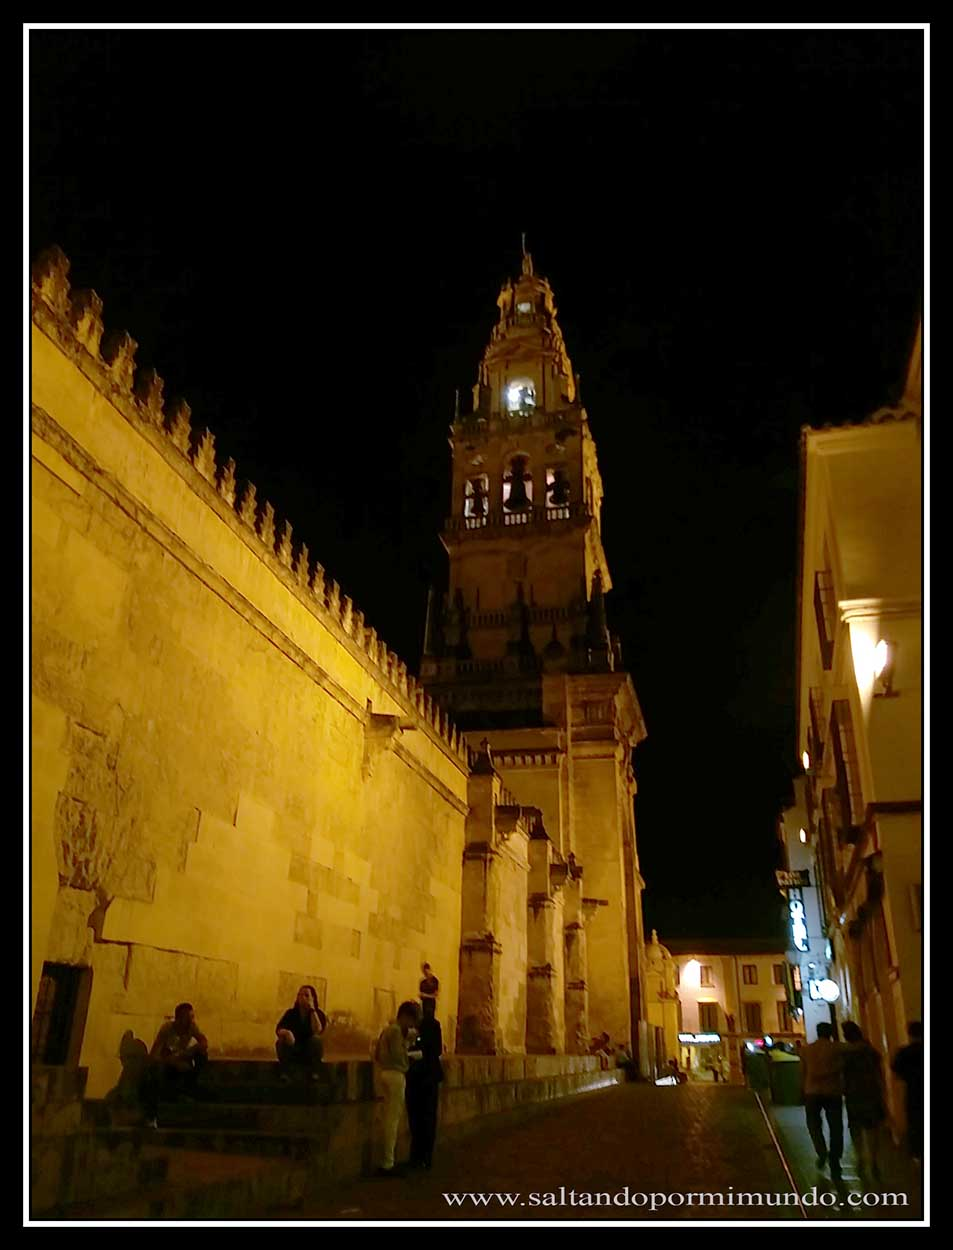 Mezquita de Córdoba de noche.